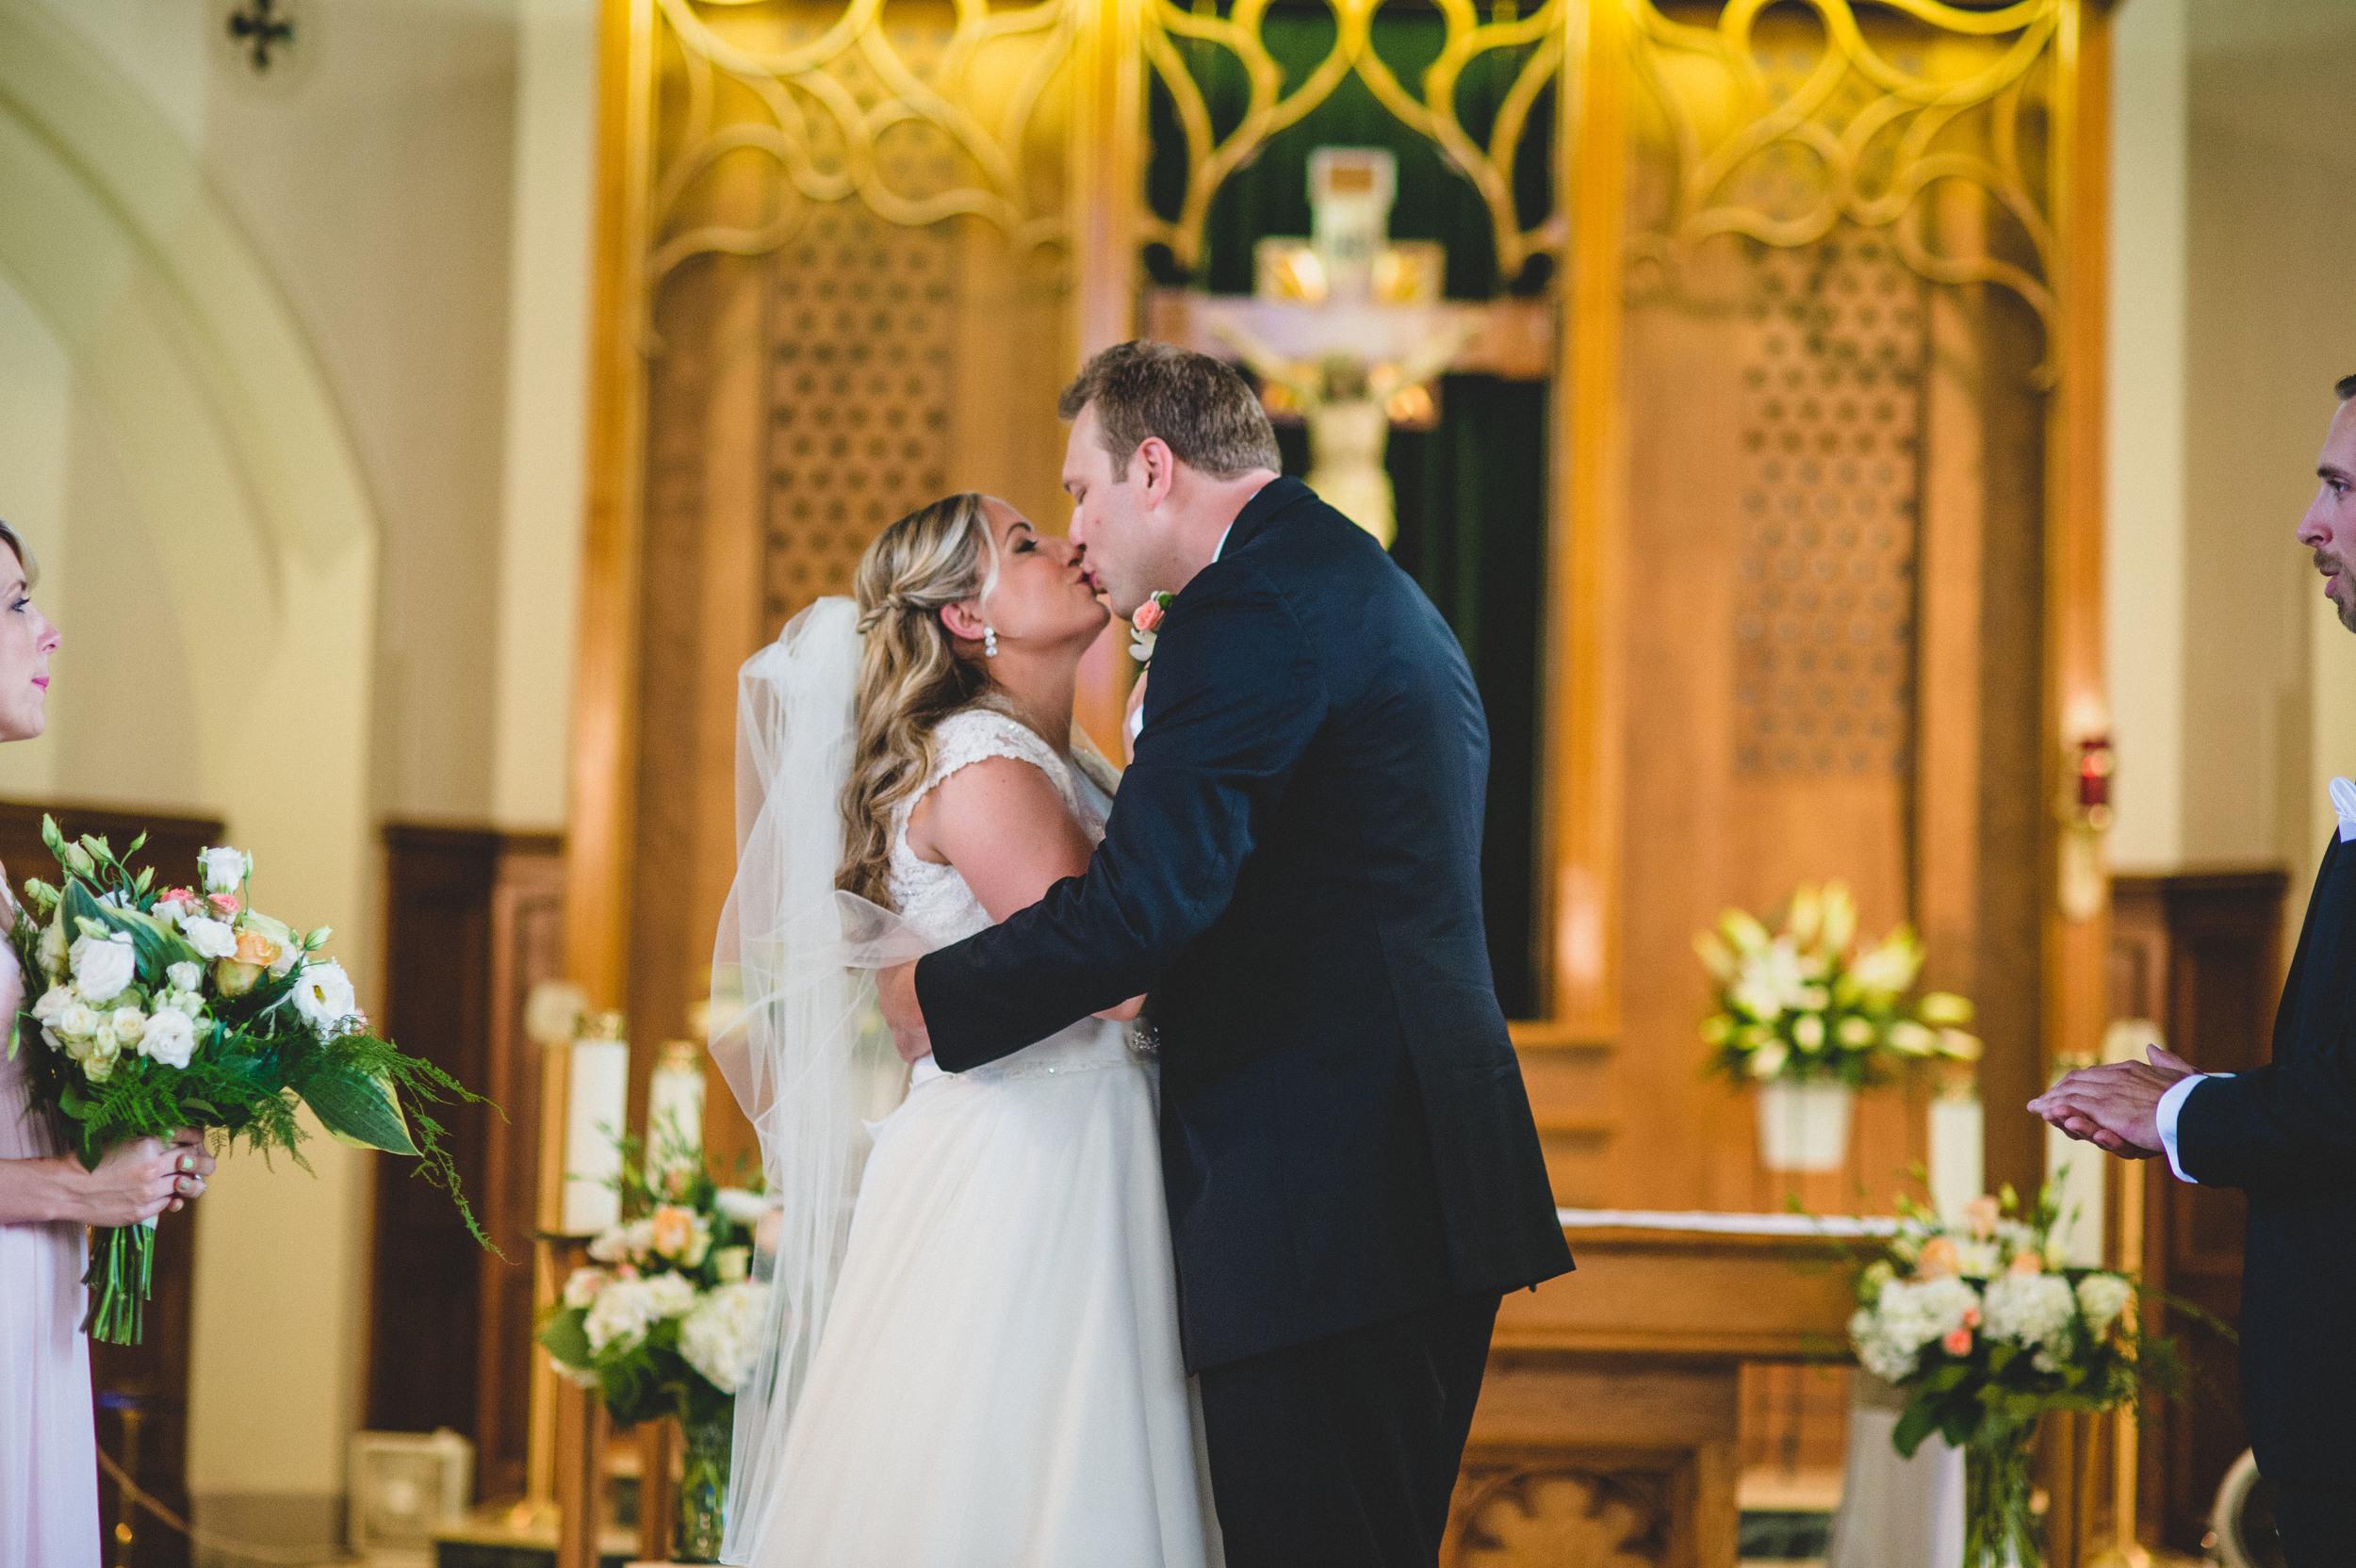 Vancouver St Augustine 's Church wedding photographer edward lai photography-46.jpg